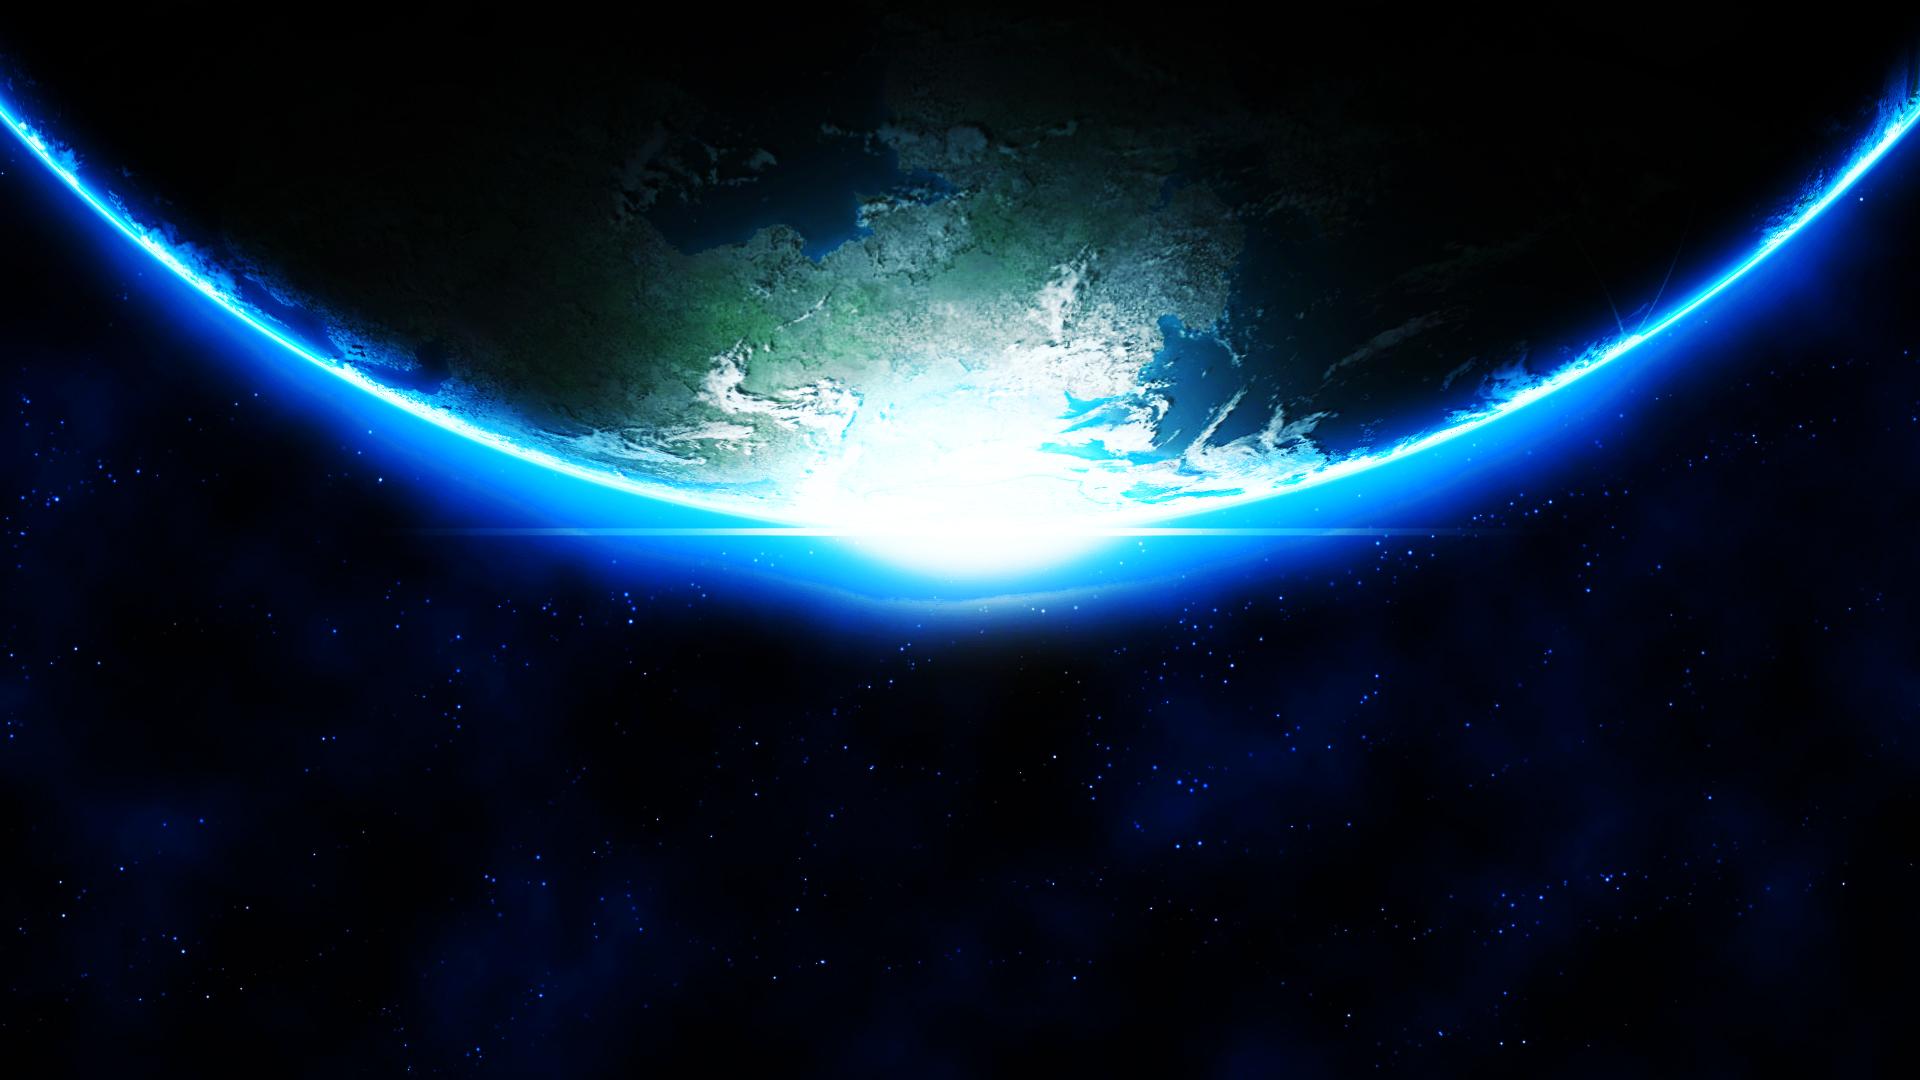 earth wallpaper hd 1080p - photo #21